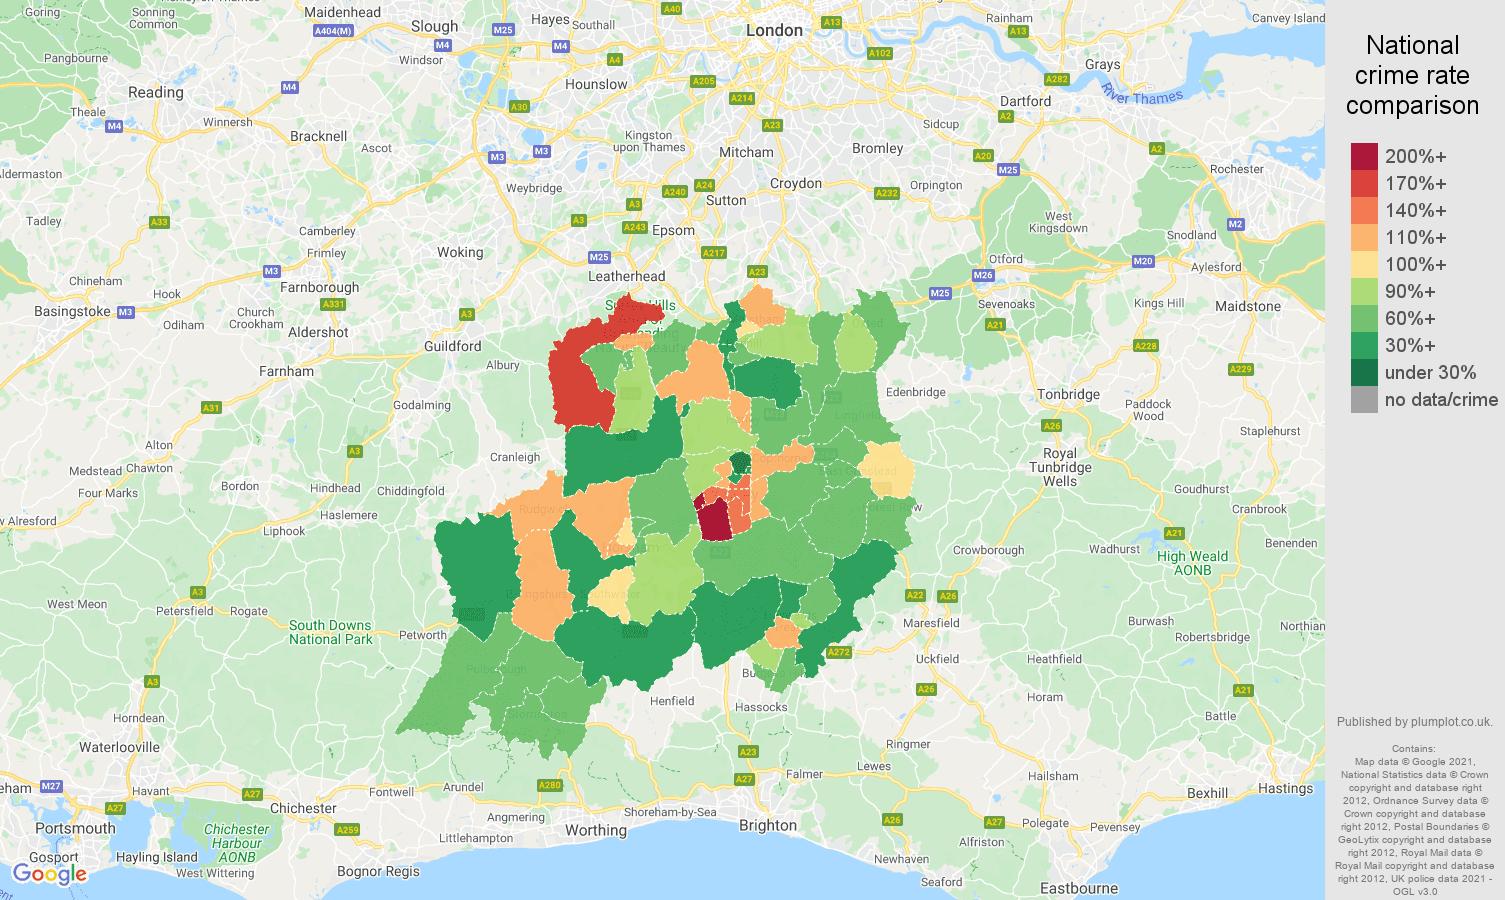 Redhill antisocial behaviour crime rate comparison map